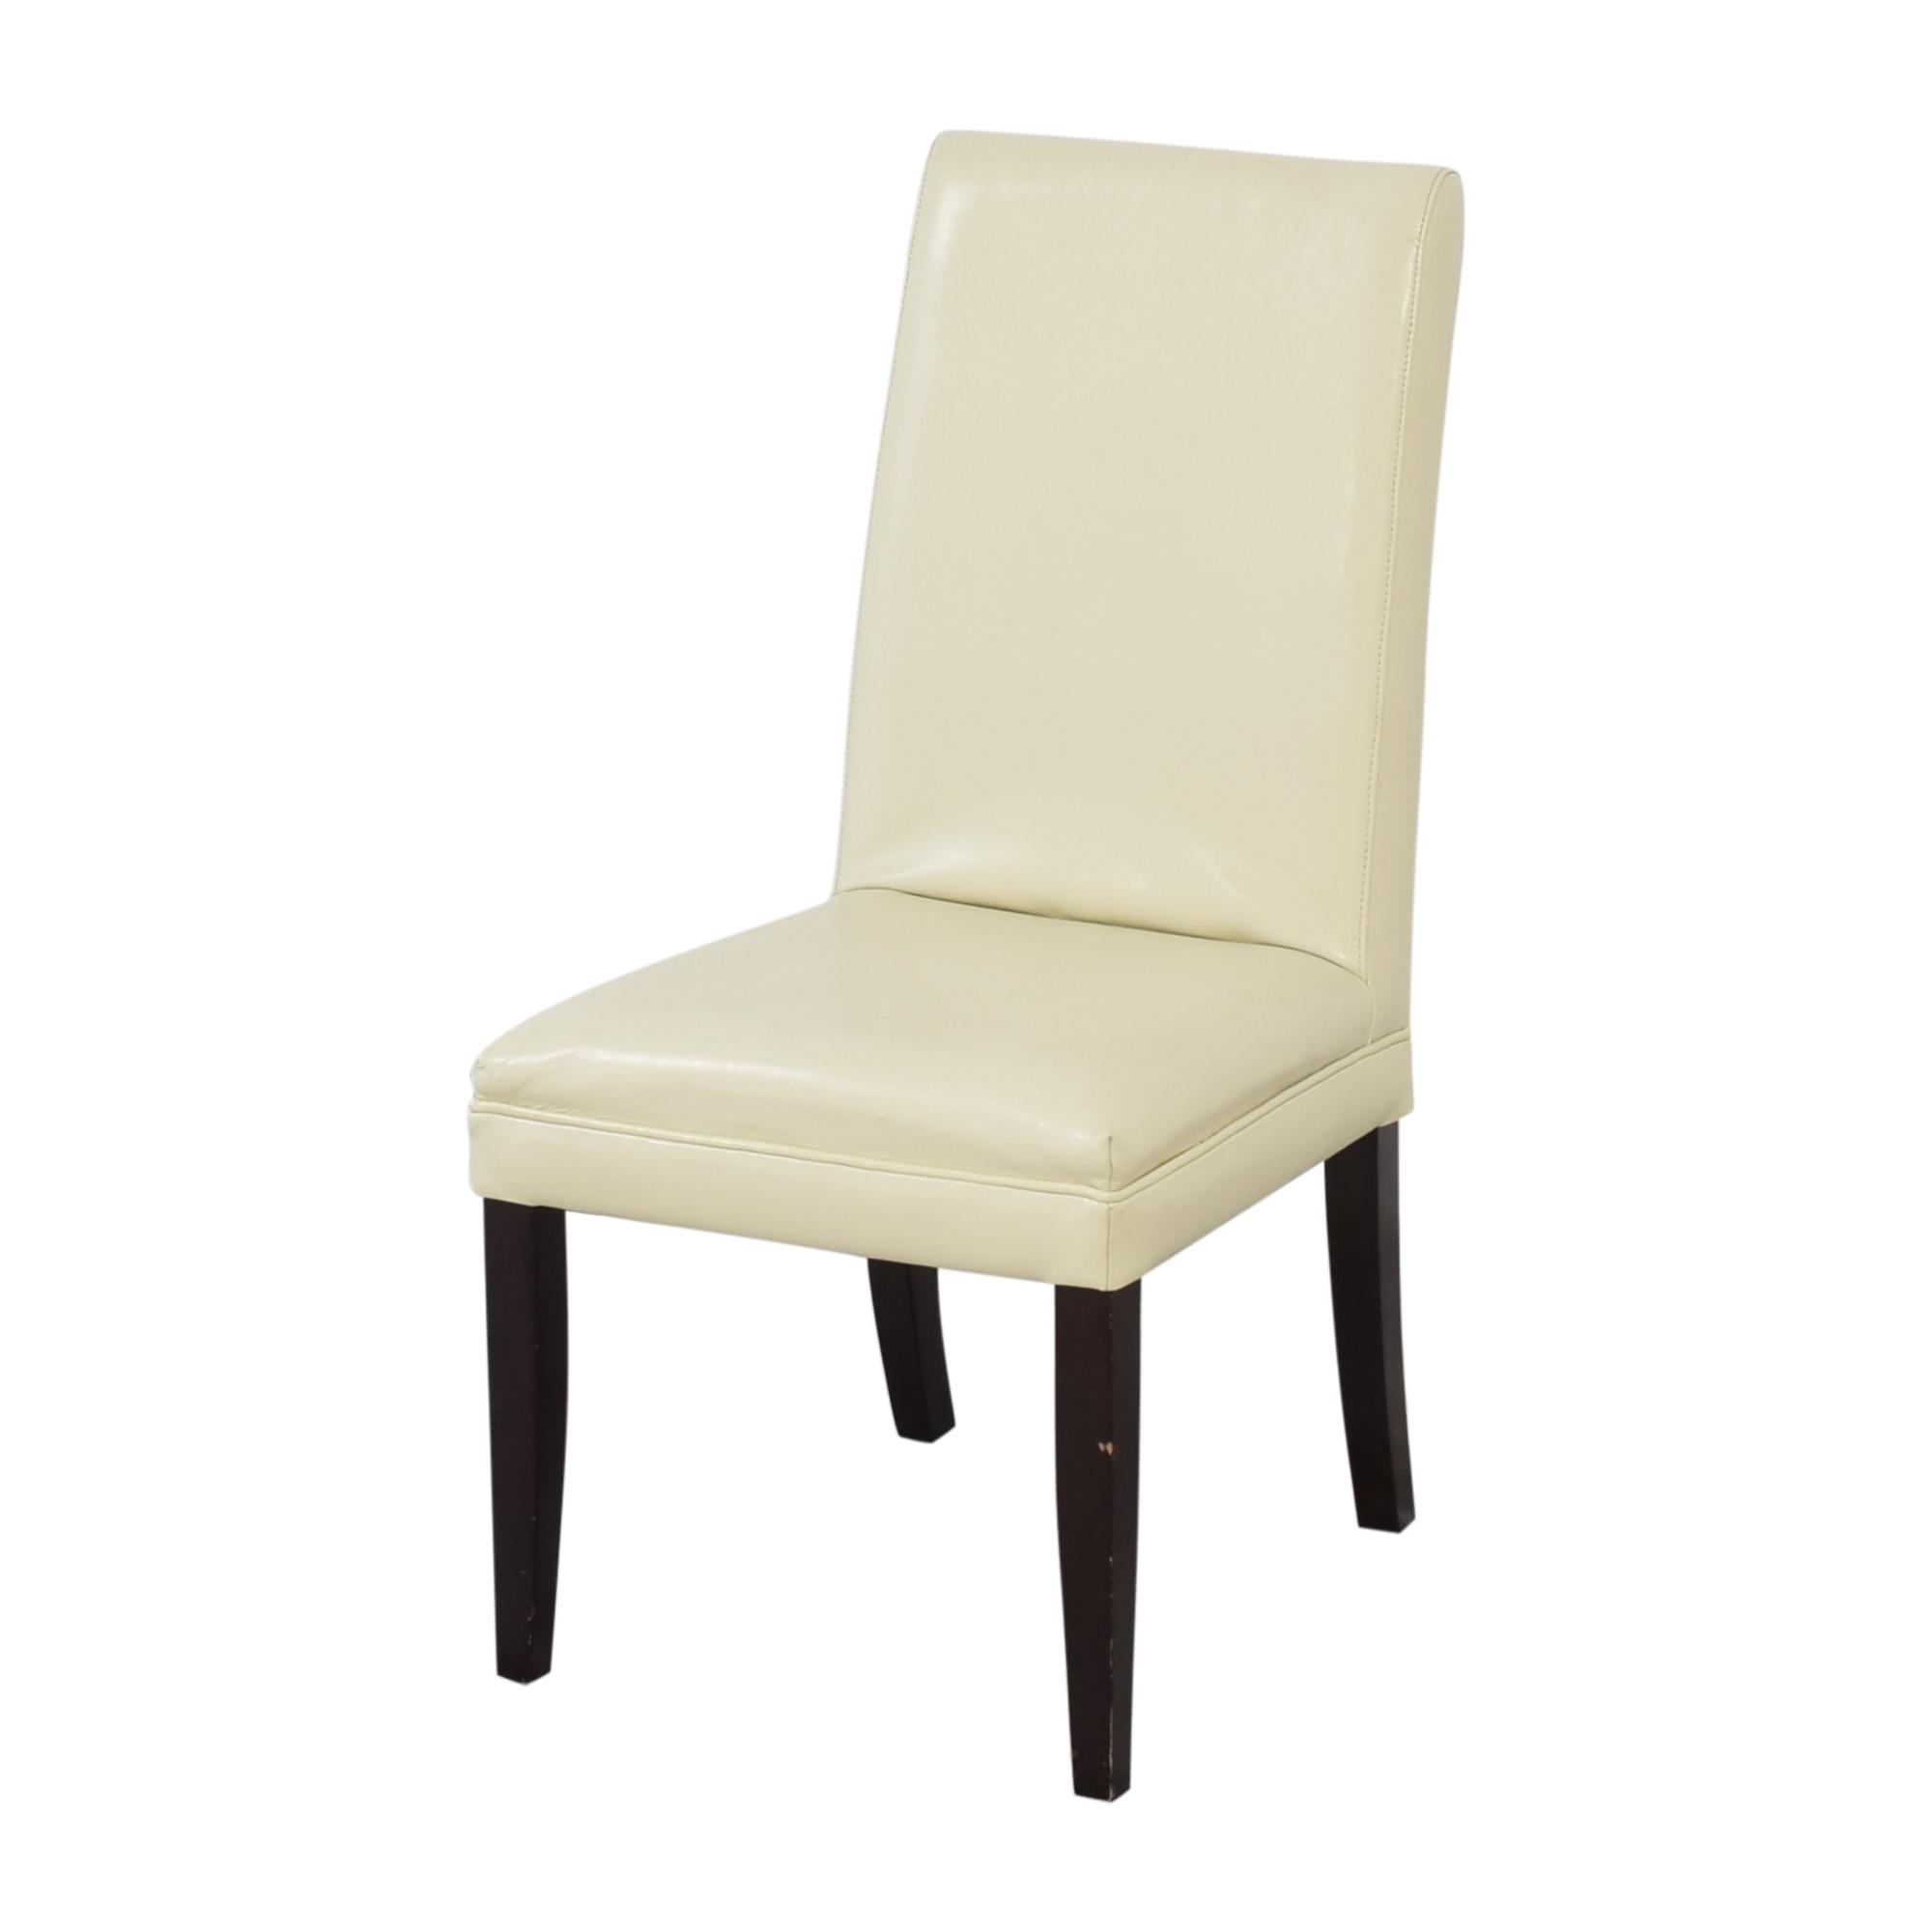 Macy's Macy's Dining Chairs